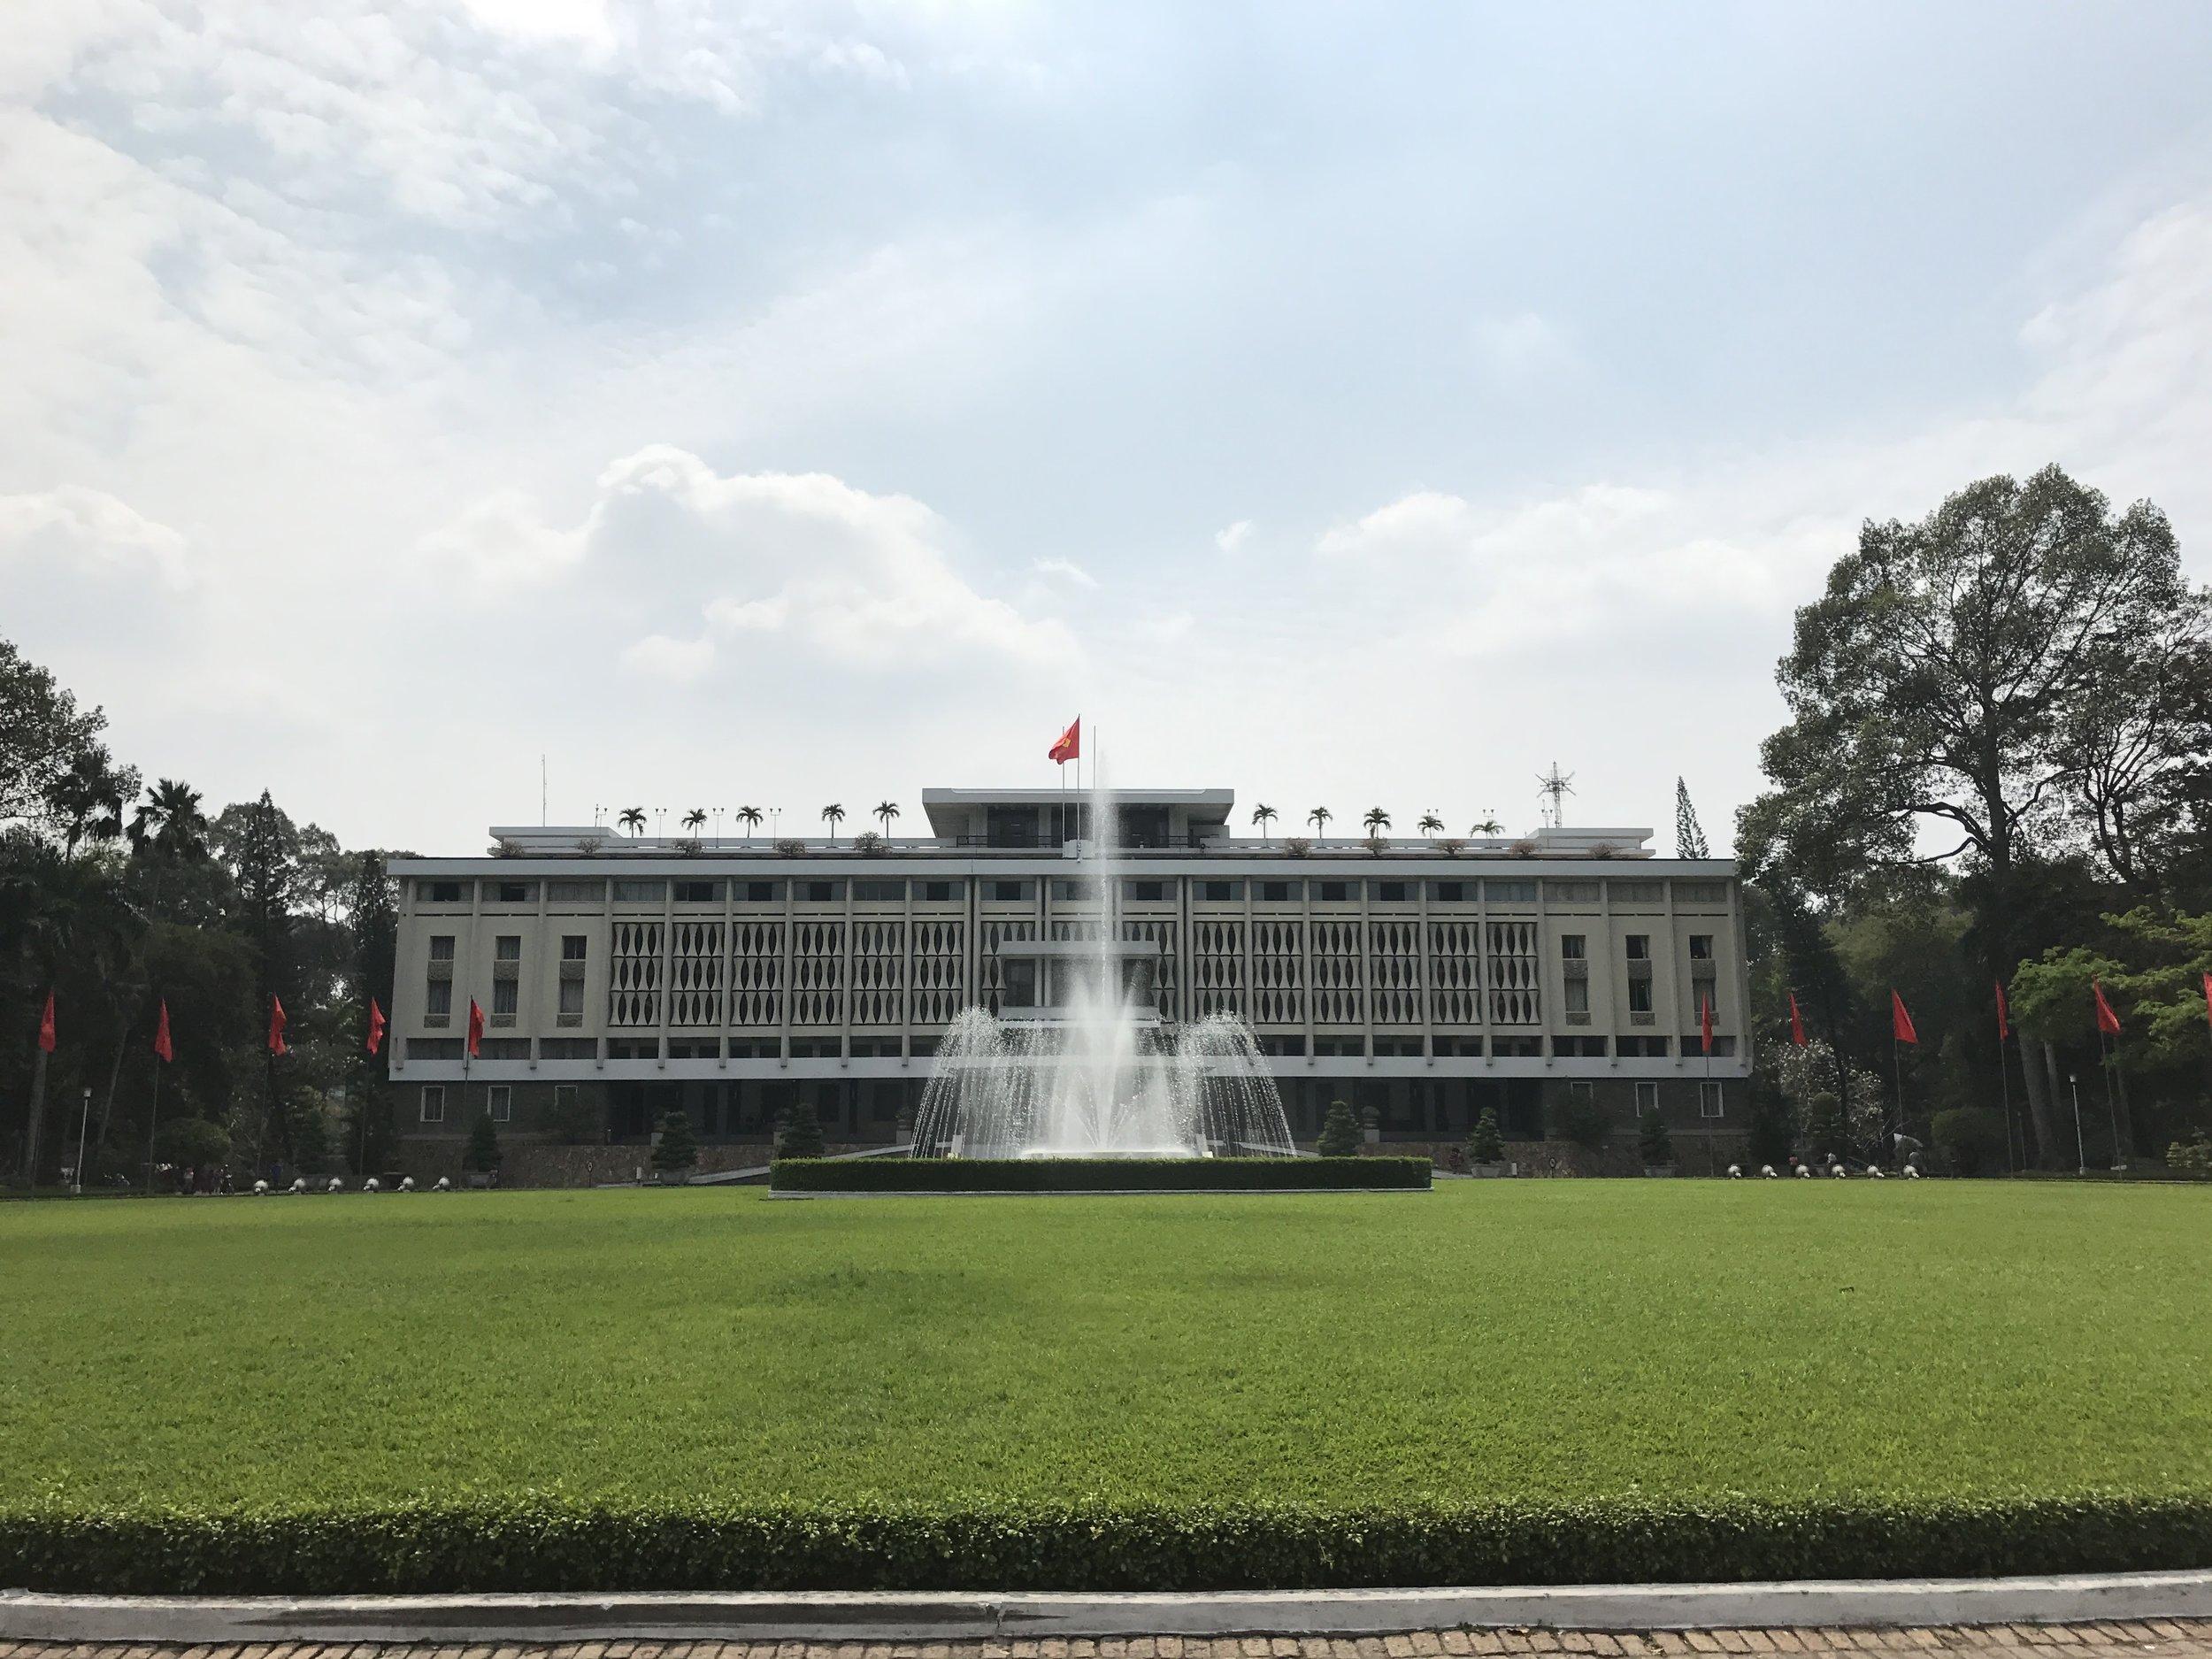 Image: Ho Chi Minh City - Saigon Reunification Palace